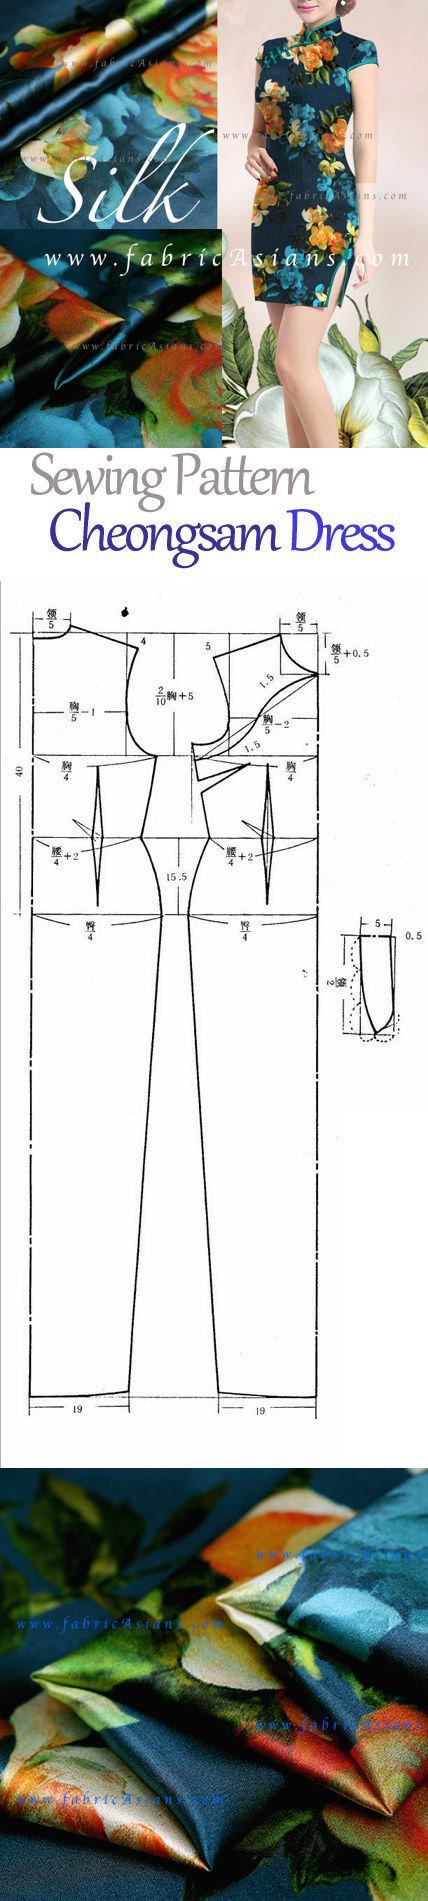 Easy cheongsam sewing pattern pdf free ropa pinterest easy cheongsam sewing pattern pdf free jeuxipadfo Choice Image